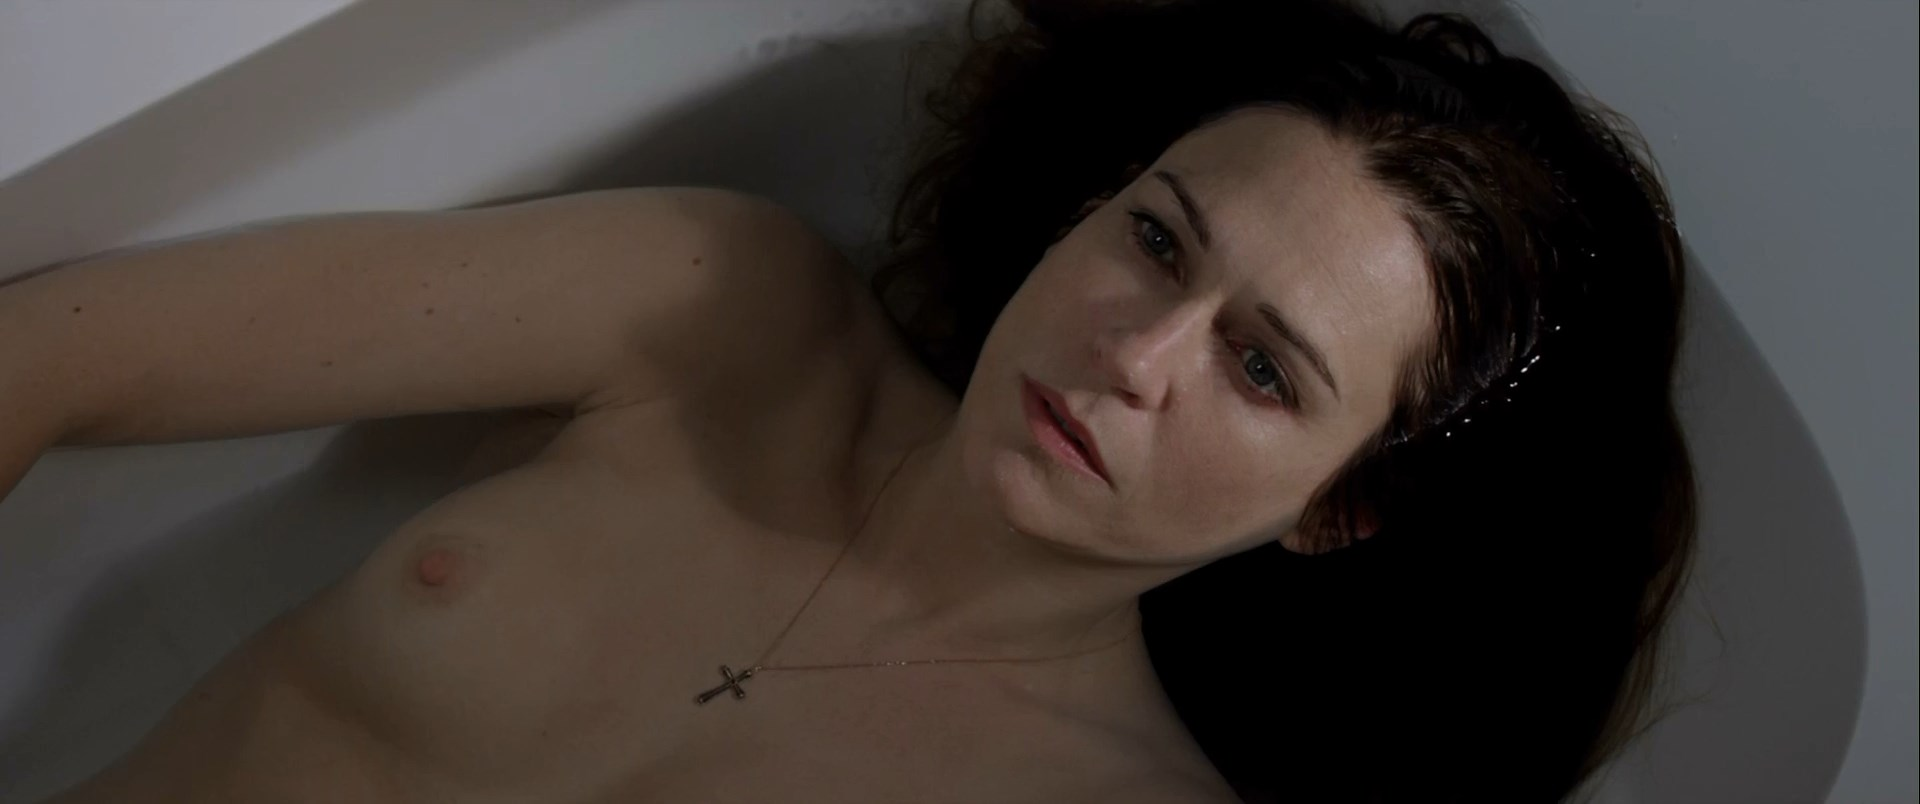 Giulia Gorietti Nude watch online - marie-josee croze, giulia ando, etc - le